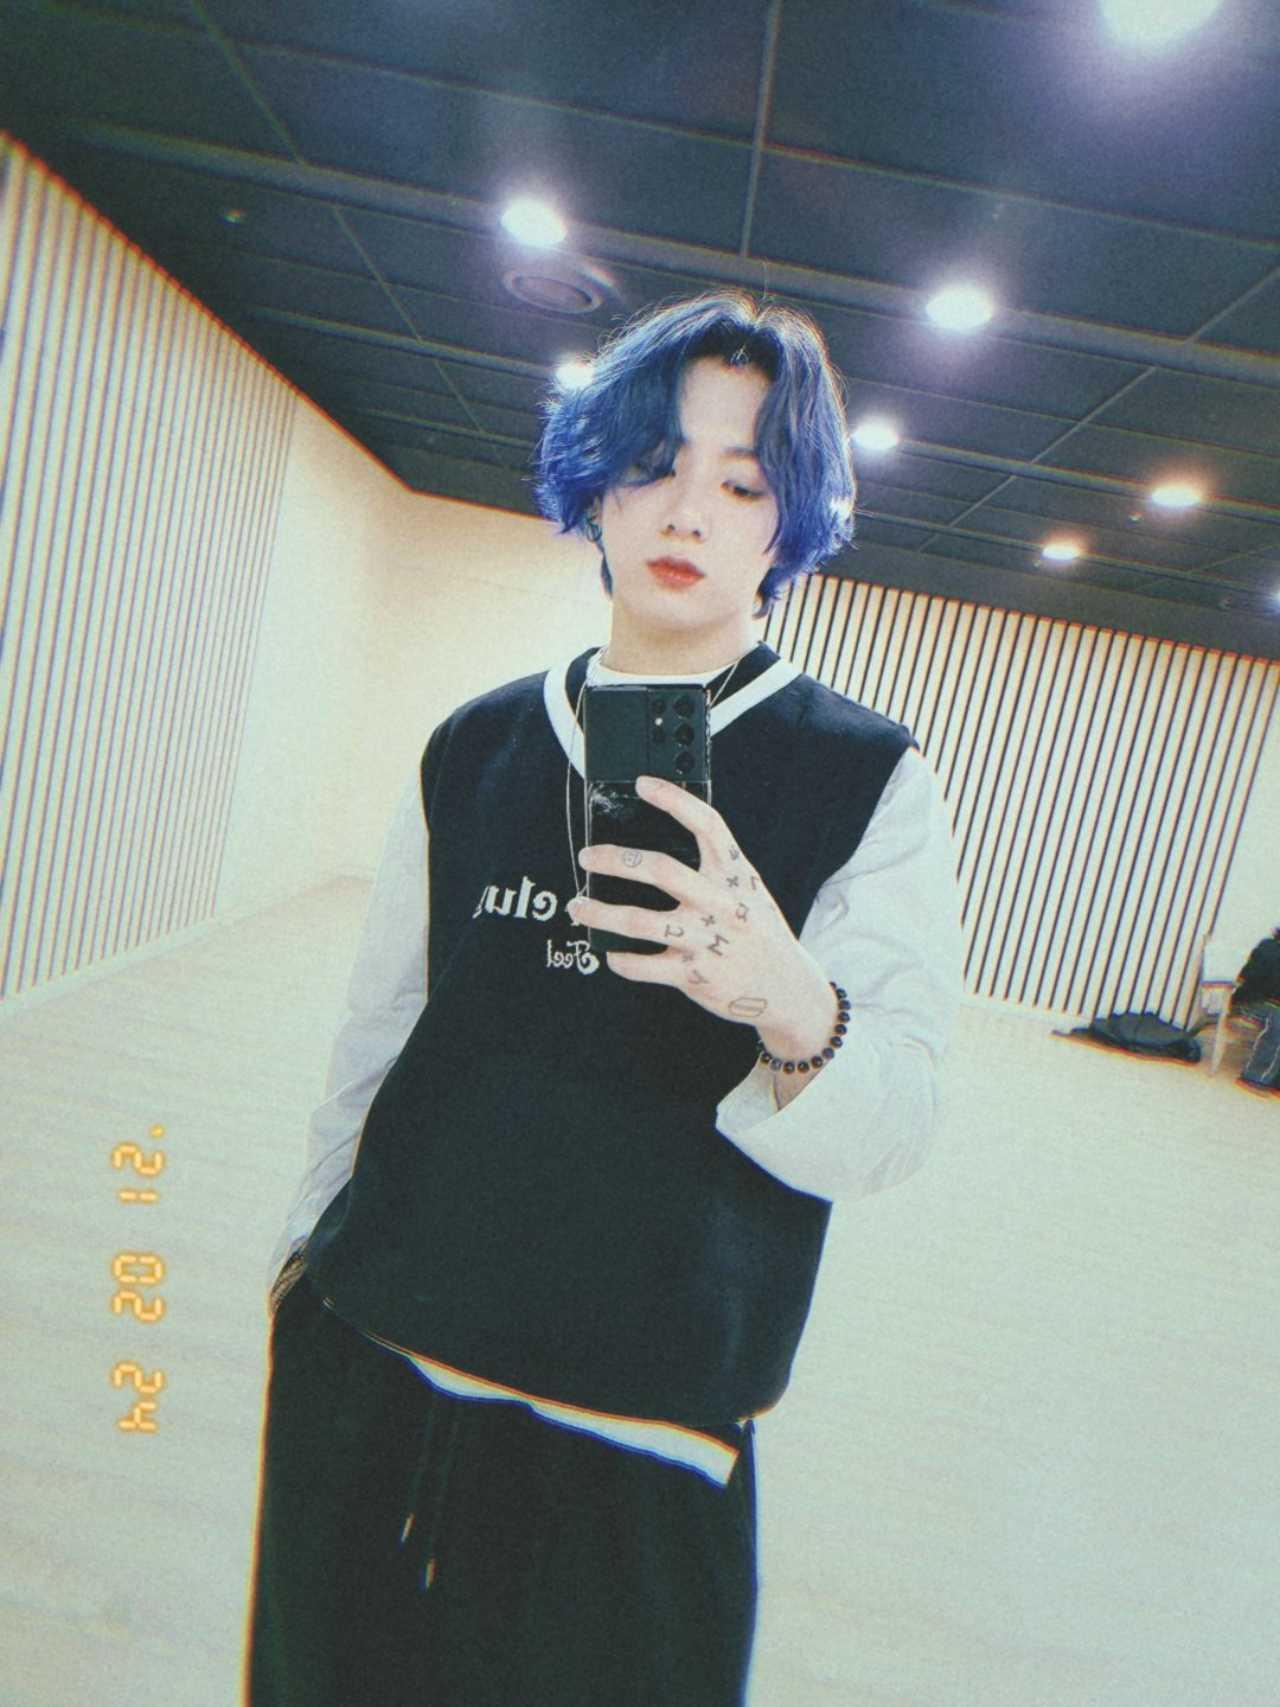 Jungkook pinta su pelo color azul